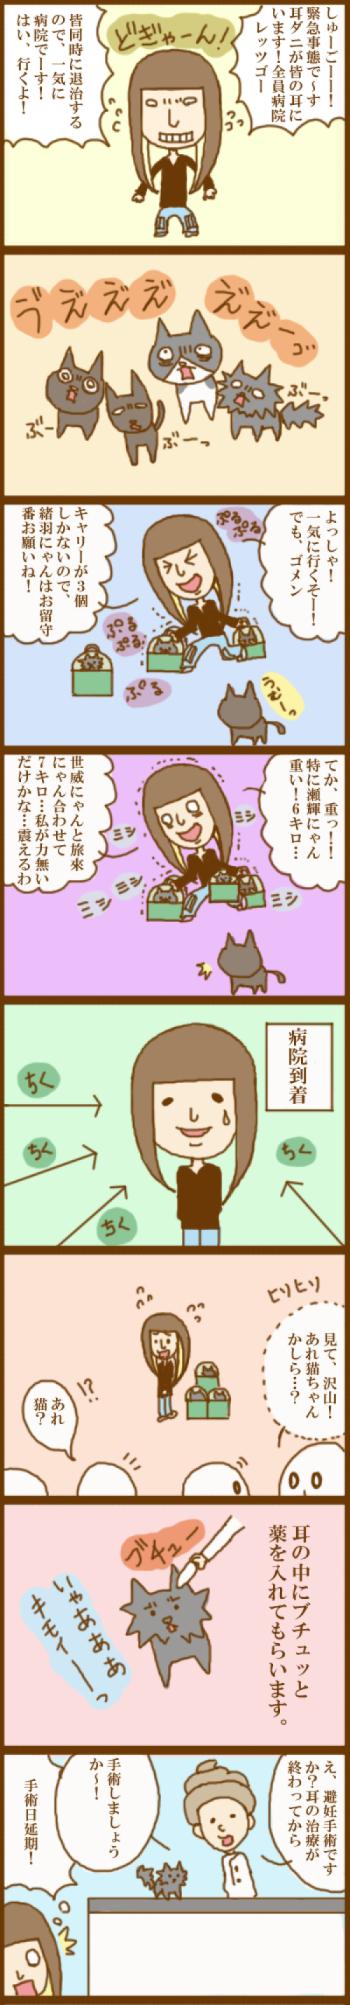 f:id:suzuokayu:20201115185747j:plain